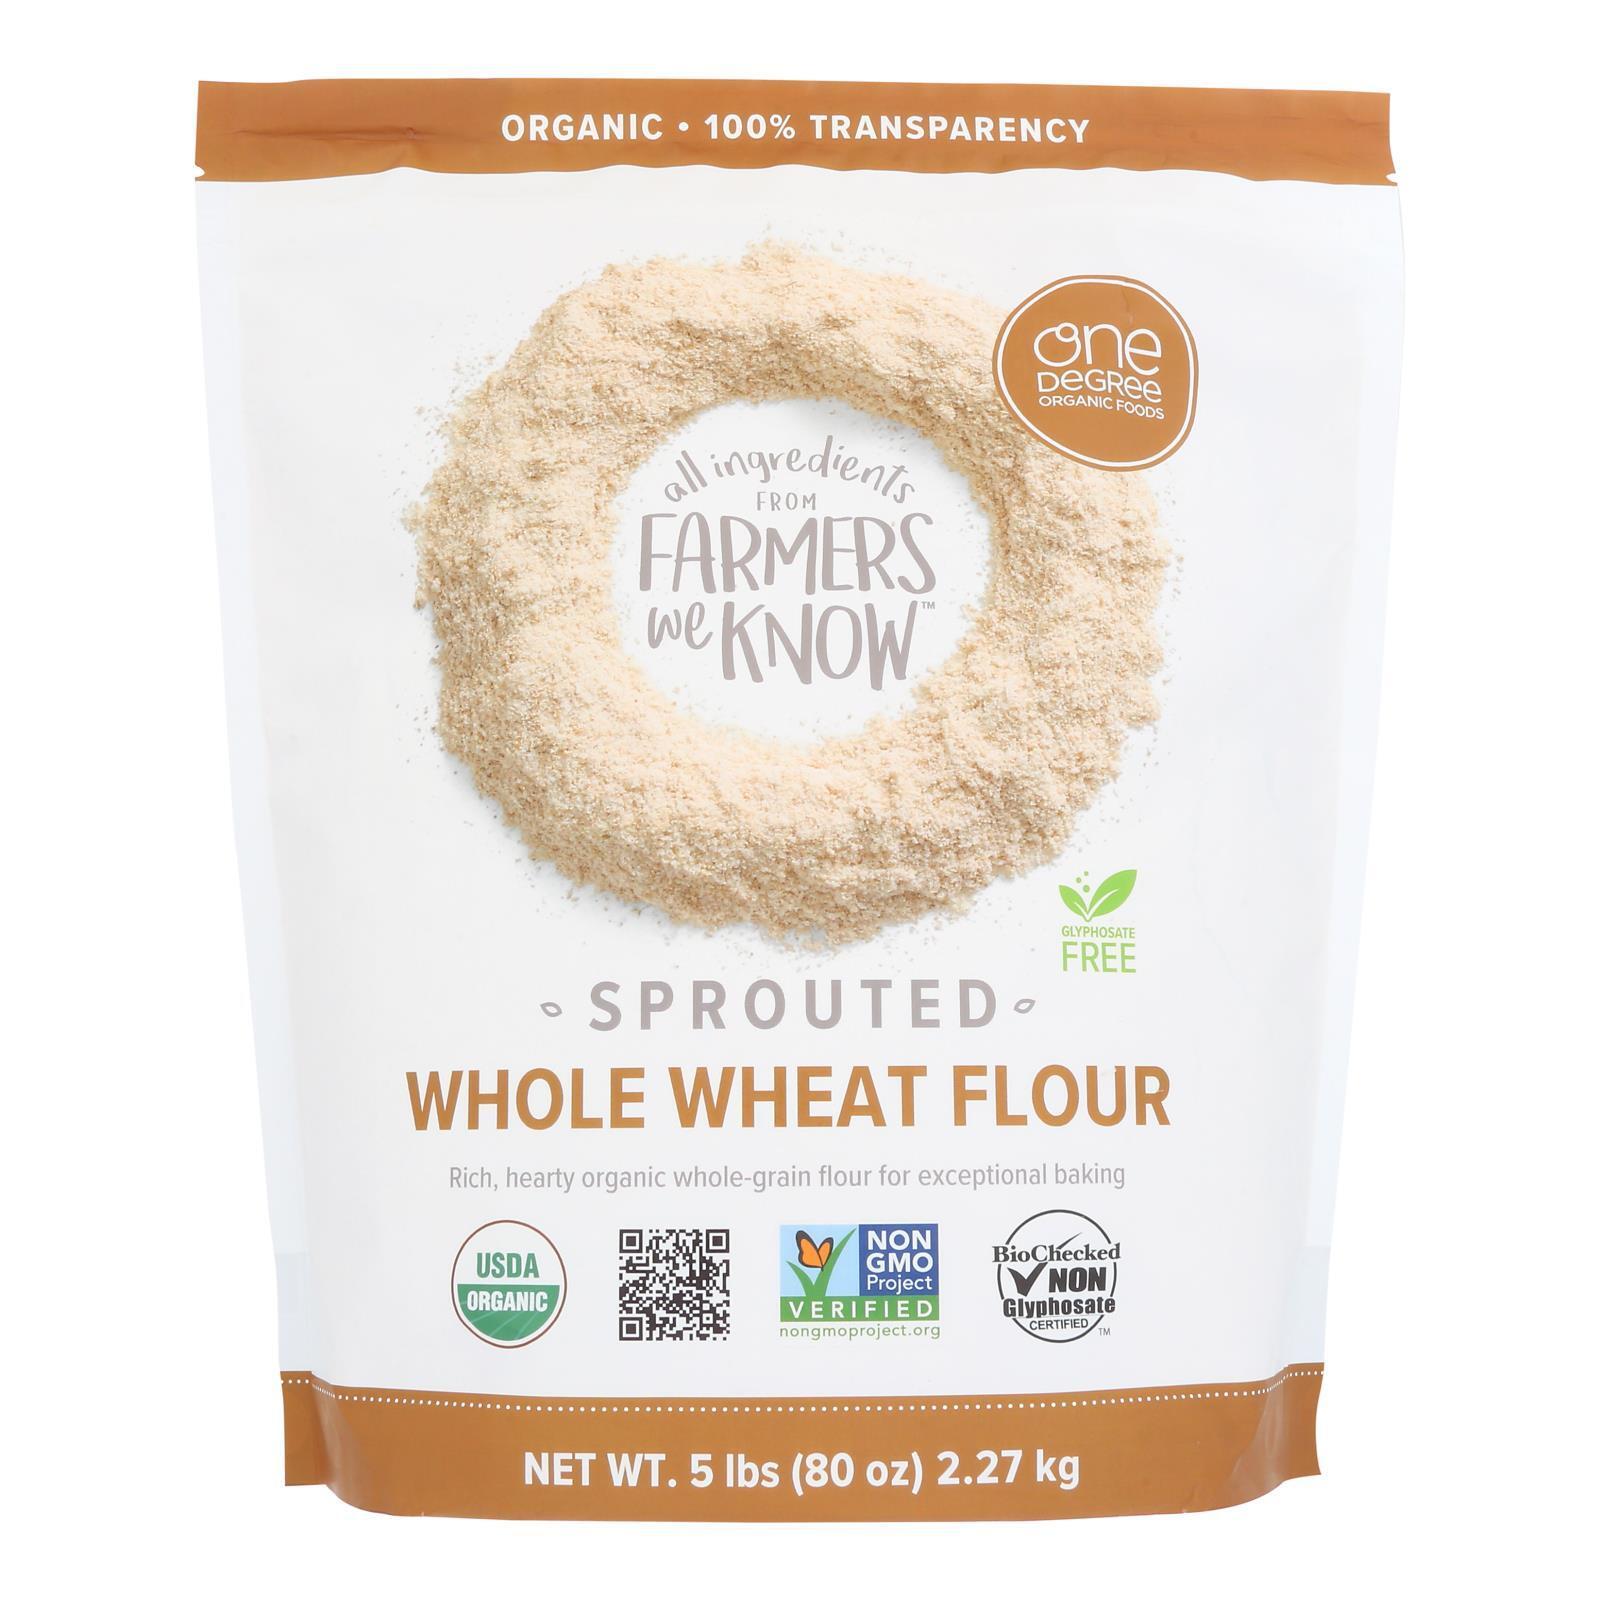 One Degree Organic Foods Whole Wheat Flour - Organic - Case of 4 - 80 oz.